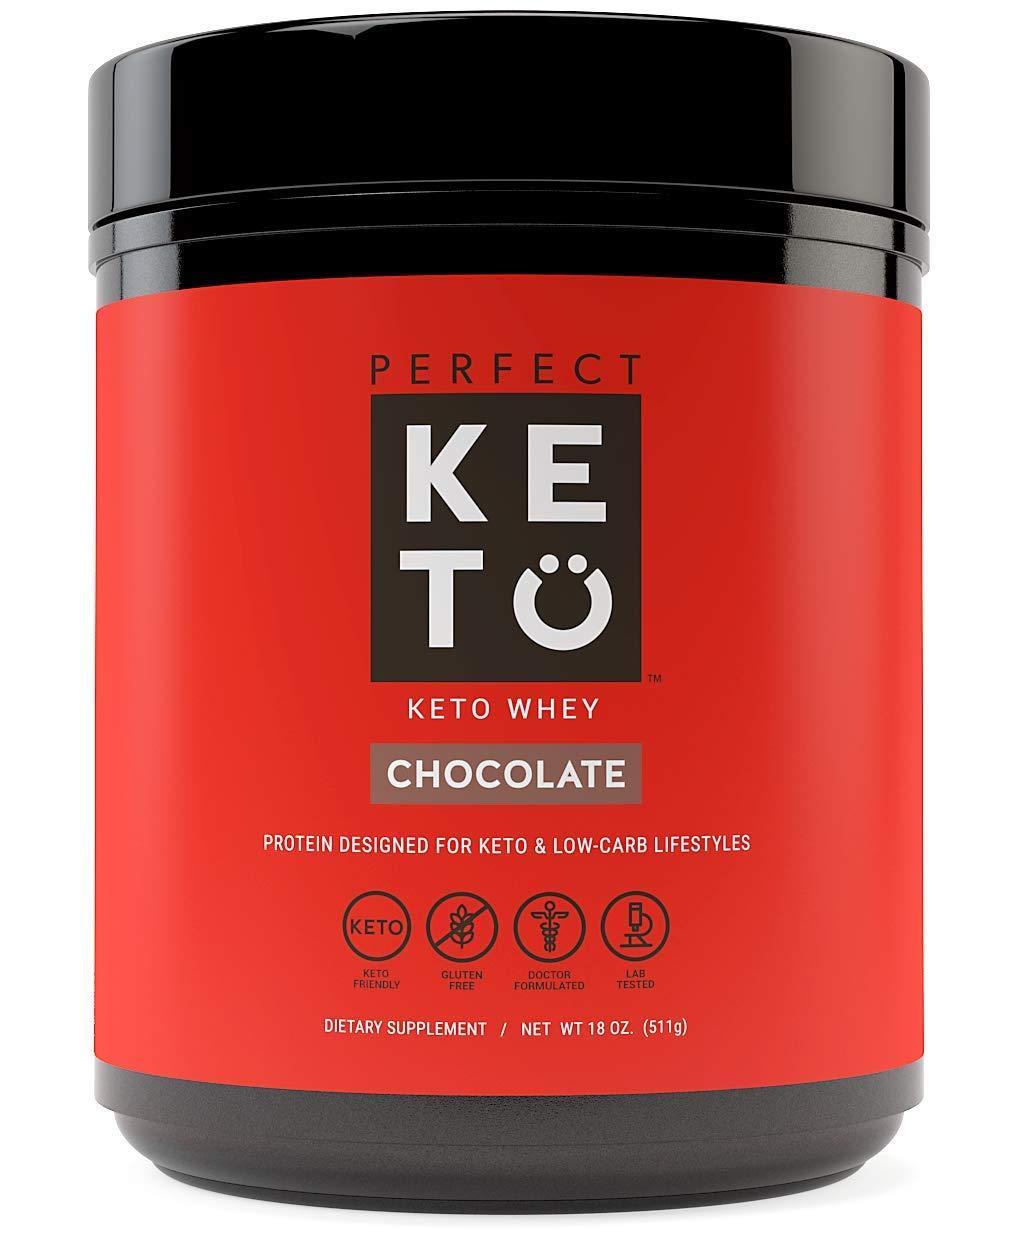 Perfect Keto Pure Whey Protein Powder Isolate | Delicious 100% Grass Fed Whey | No Artificials, Gluten Free, Soy Free, Non-GMO (Chocolate) by Perfect Keto